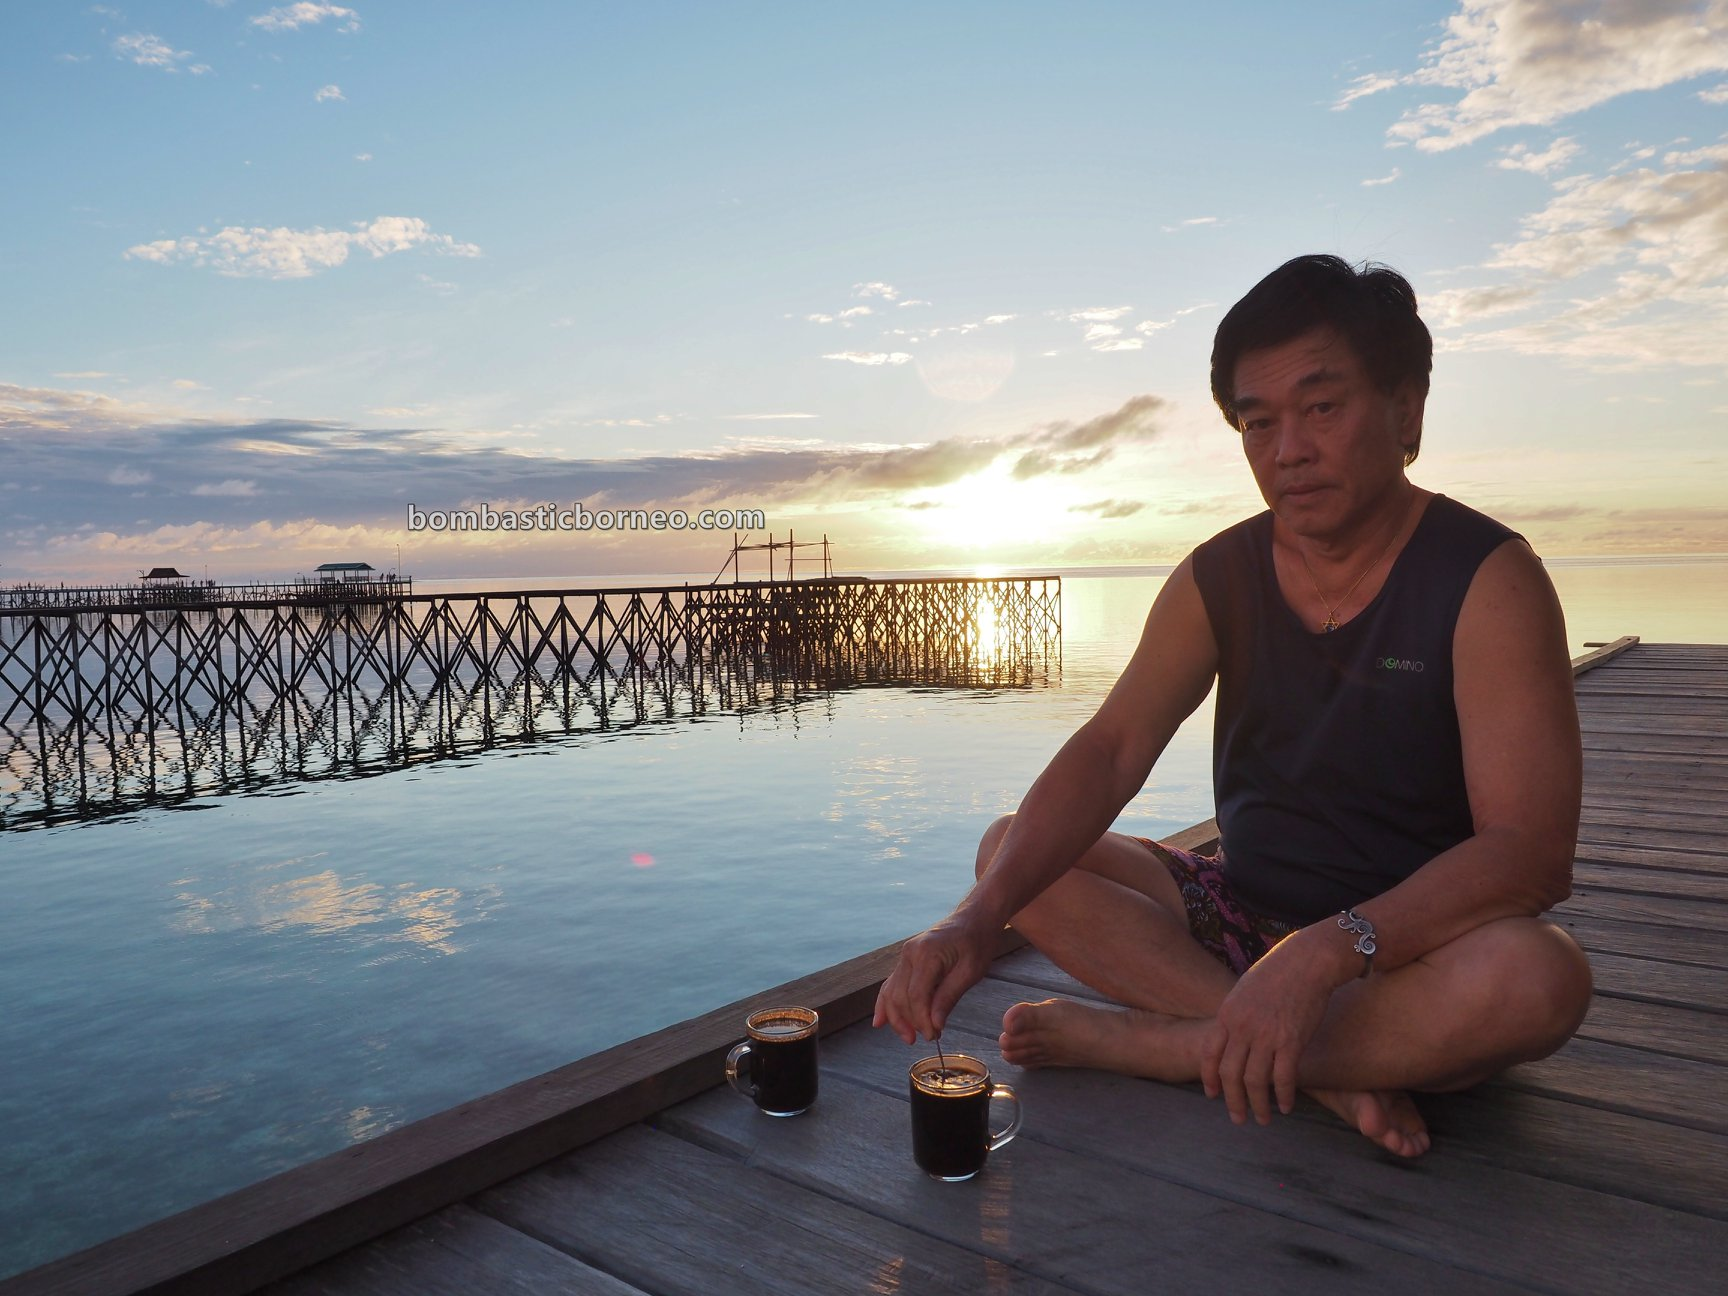 backpackers, Destination, diving spot, nature, hidden paradise, vacation, diving site, snorkelling, Berau, Sulawesi Sea, Pariwisata, Tourism, travel guide, 印尼东加里曼丹, 达拉湾岛旅游景点,